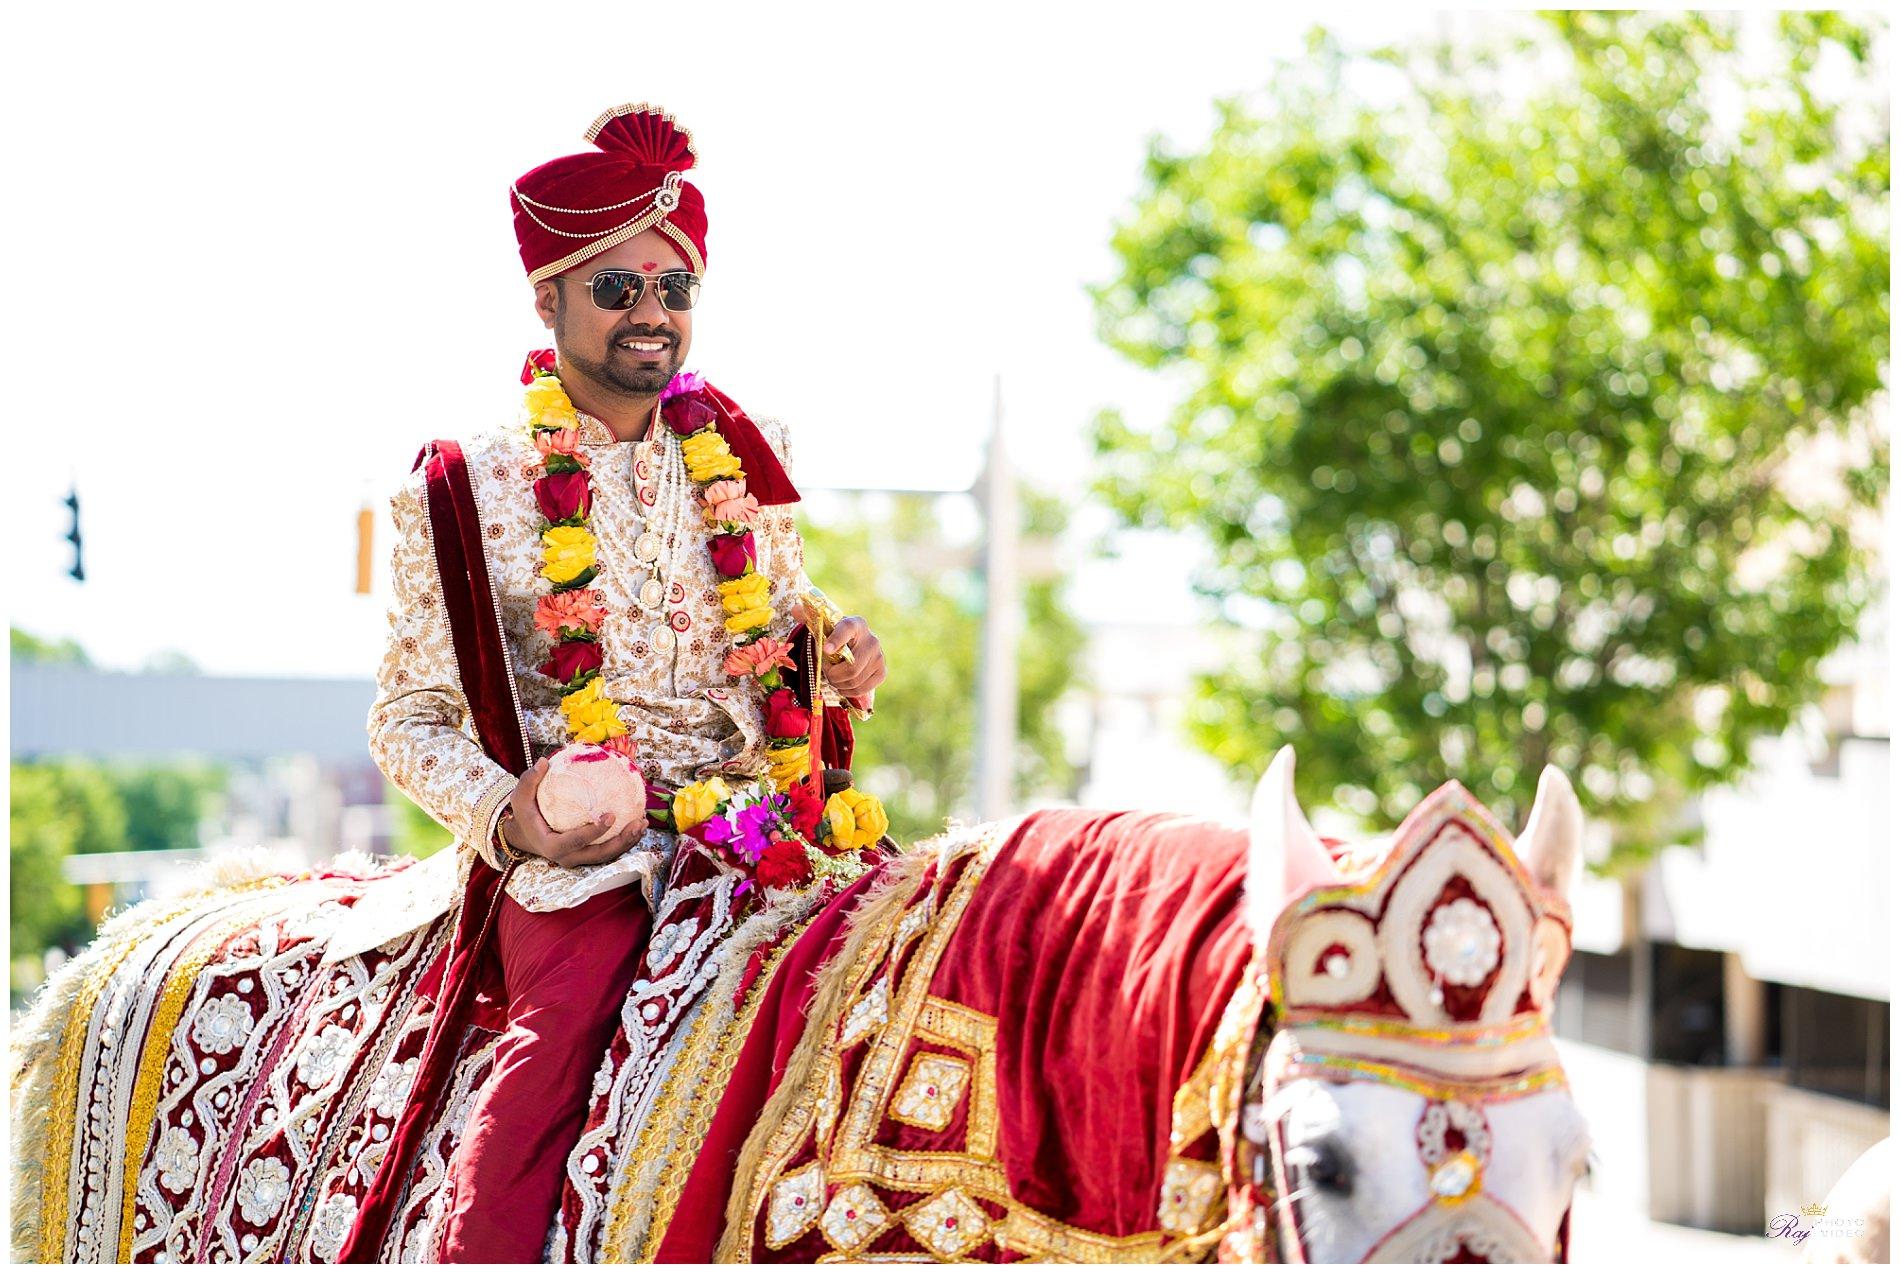 doubletree-by-hilton-hotel-wilmington-de-wedding-krishna-ritesh-46.jpg